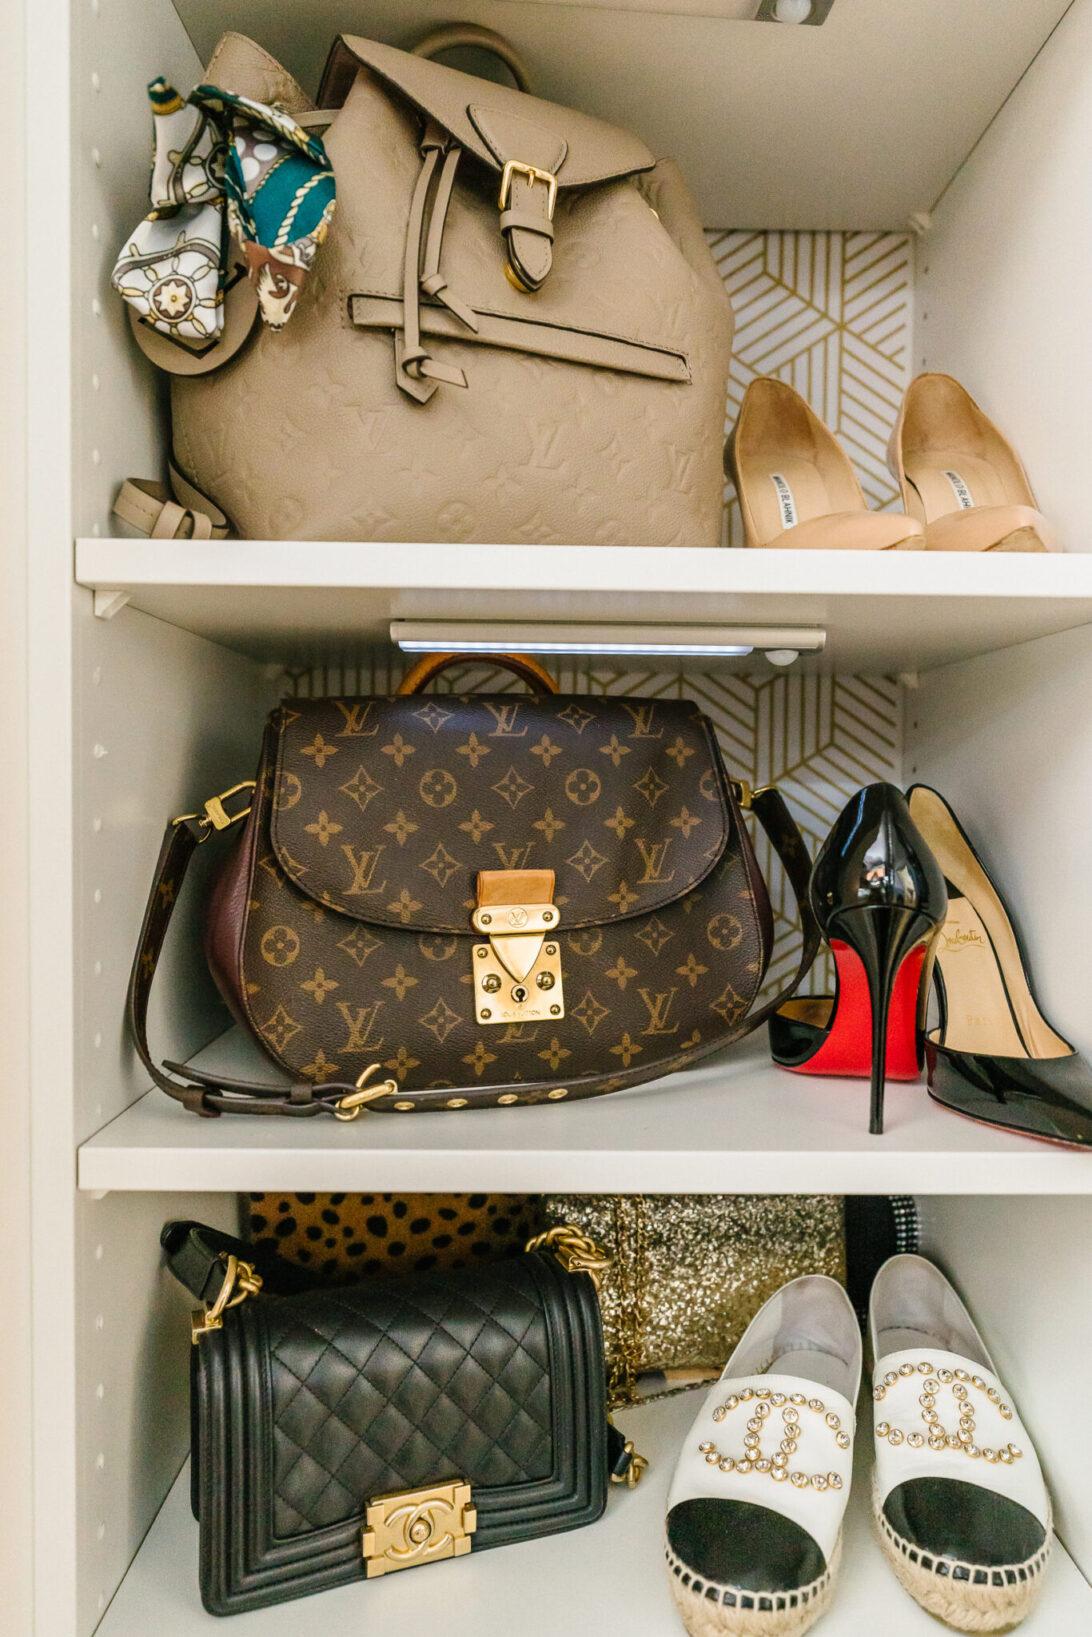 Louis Vuitton BACKPACK, CHANEL BOY BAG, CHANEL ESPADRILLES